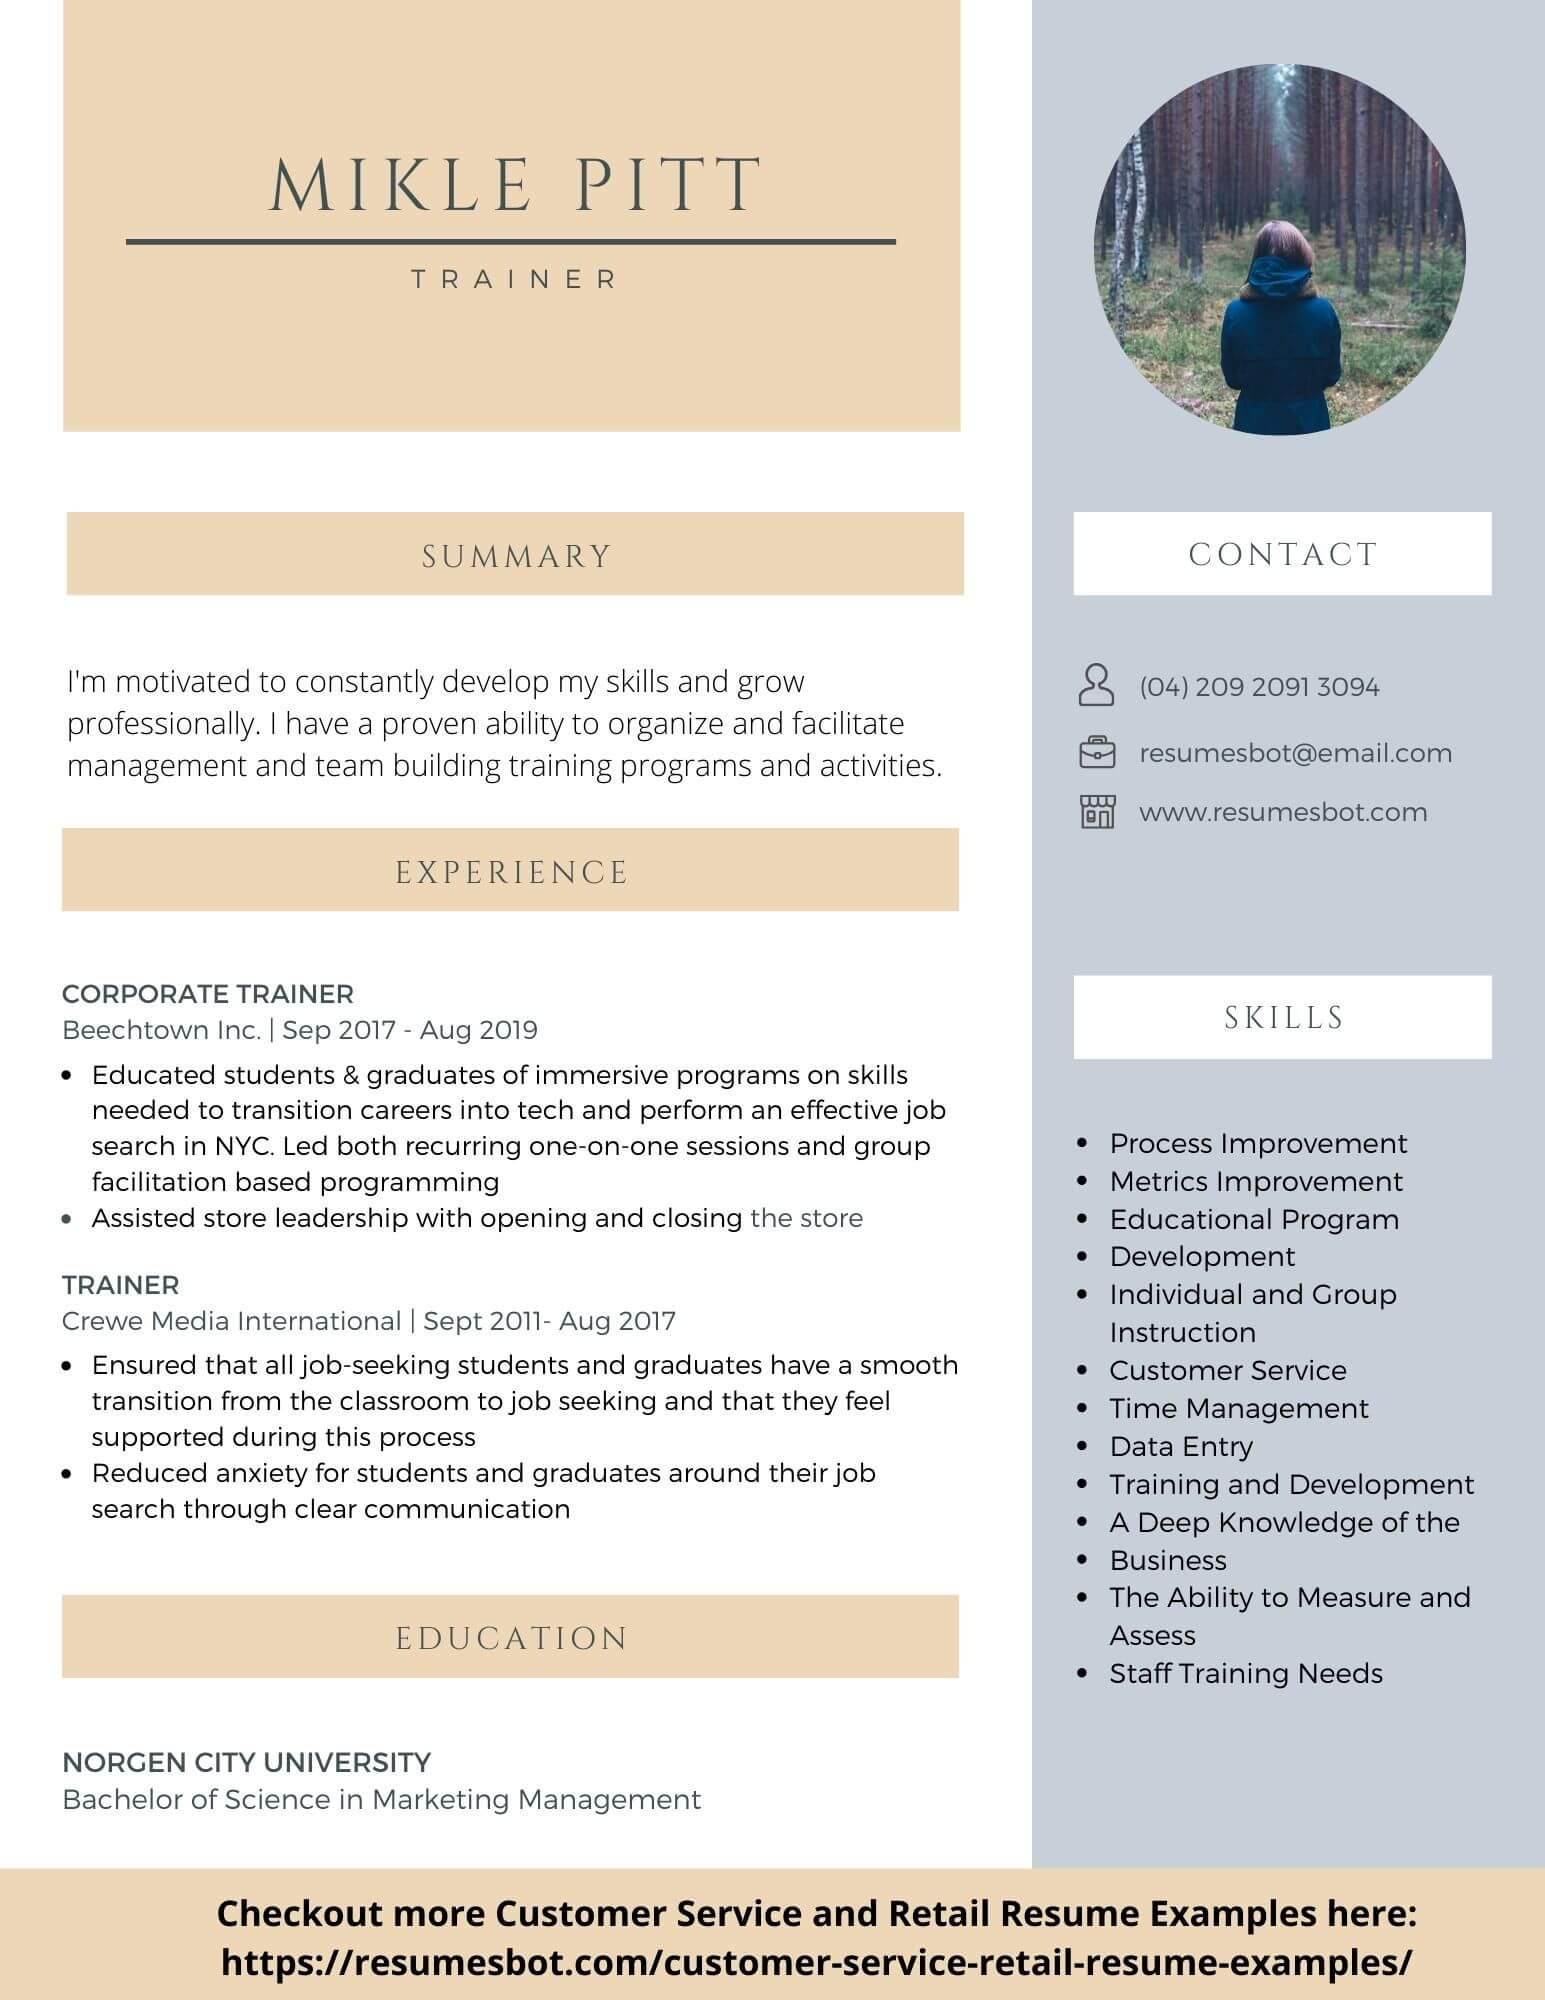 Trainer Resume Samples Salary, Certification, Keywords